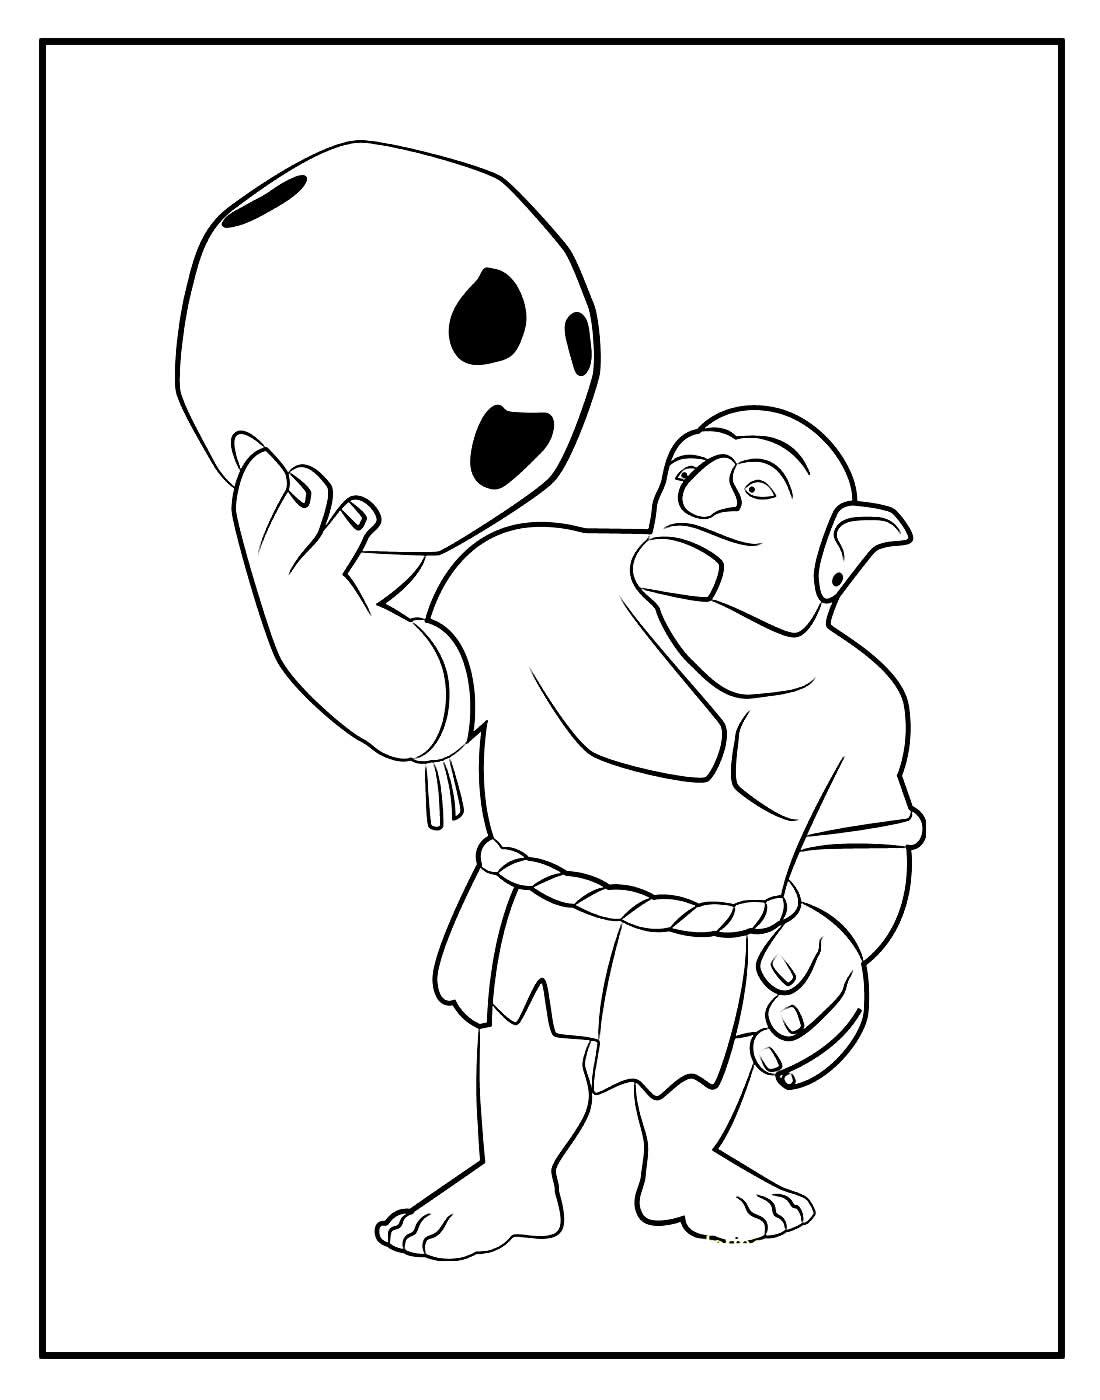 Desenho para colorir de Lançador - Clash of Clans